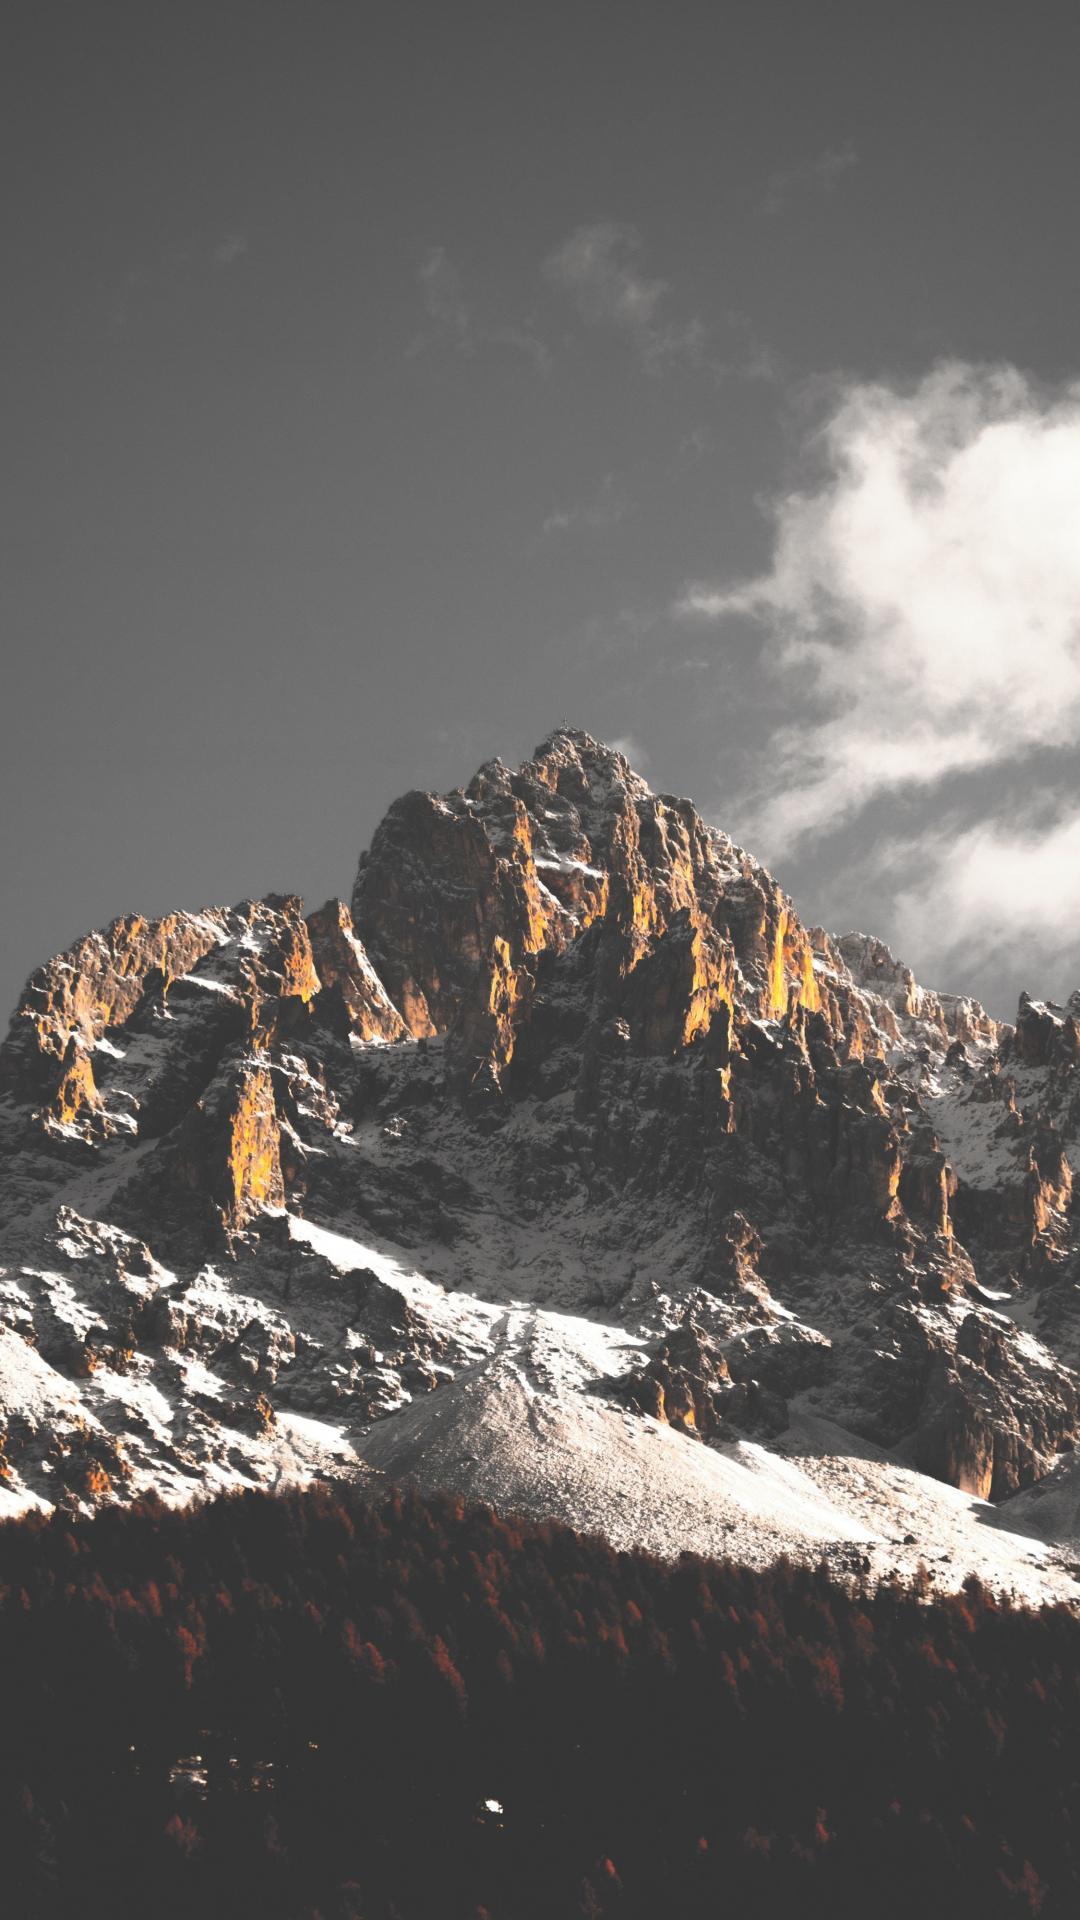 1080x1920 wallpaper Mountains, cliffs, nature, tree, 5k